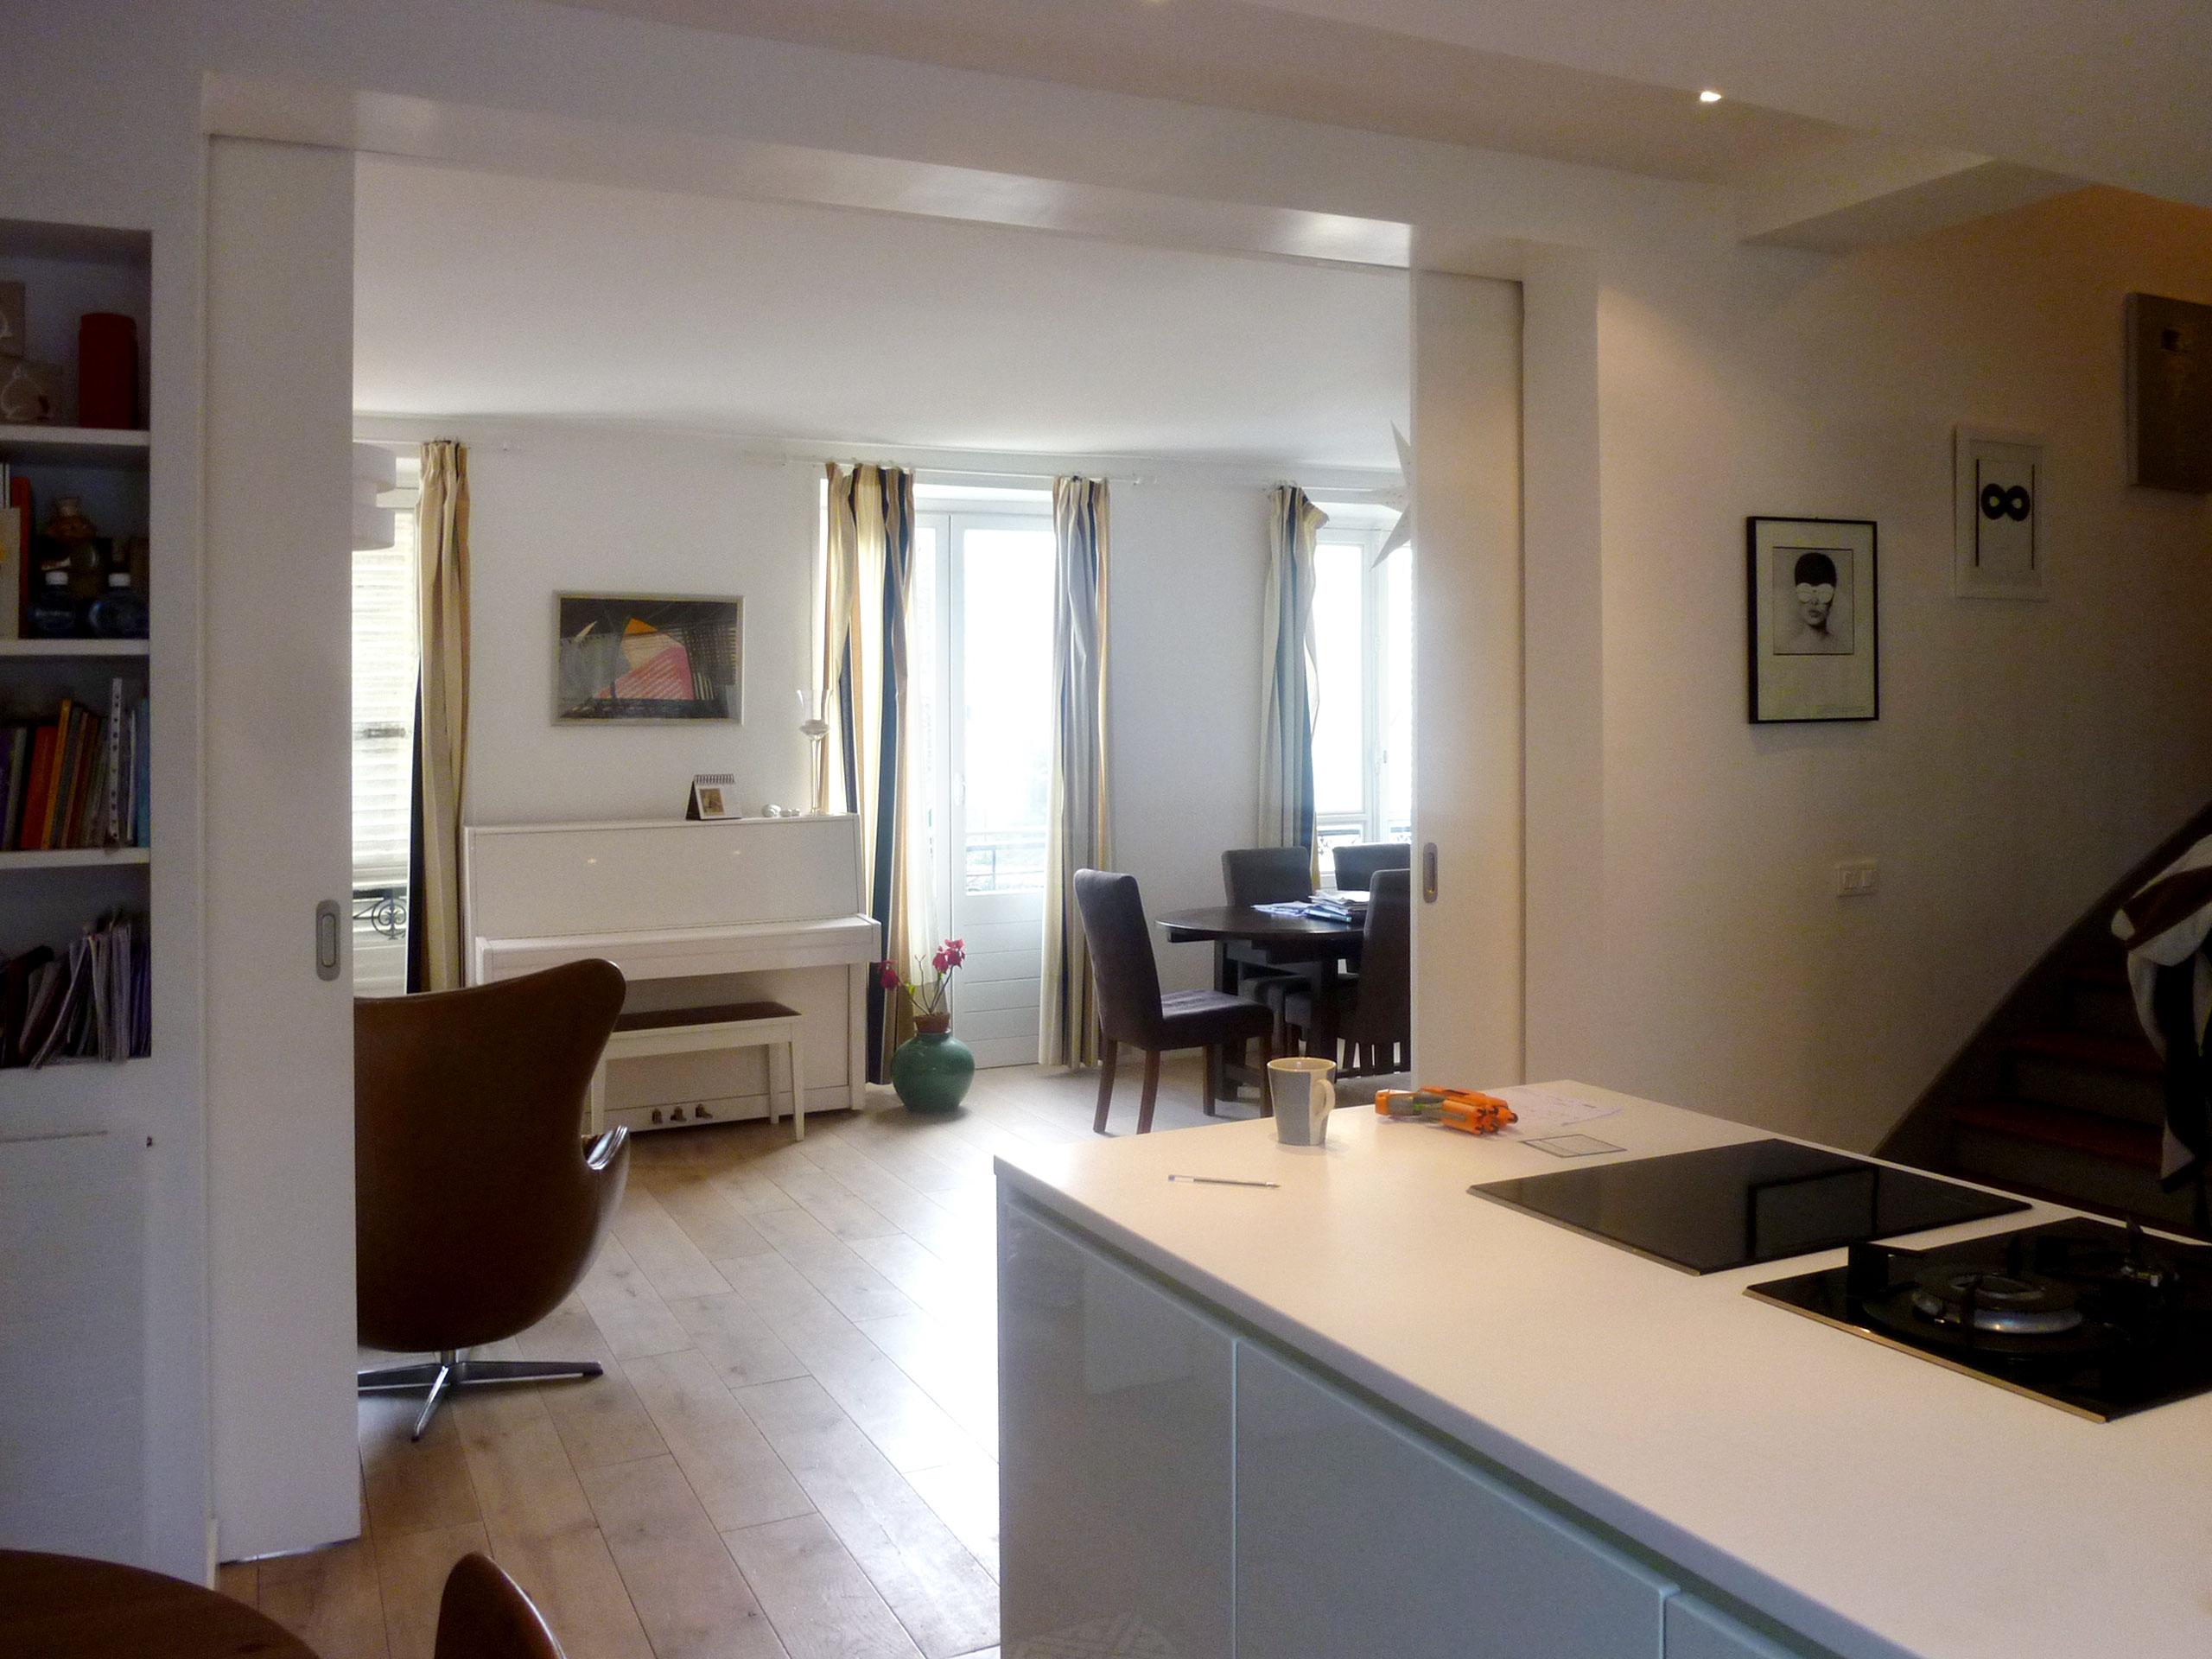 olivier-stadler-architecte-meudon-rehabilitation-extensions-maison (15)